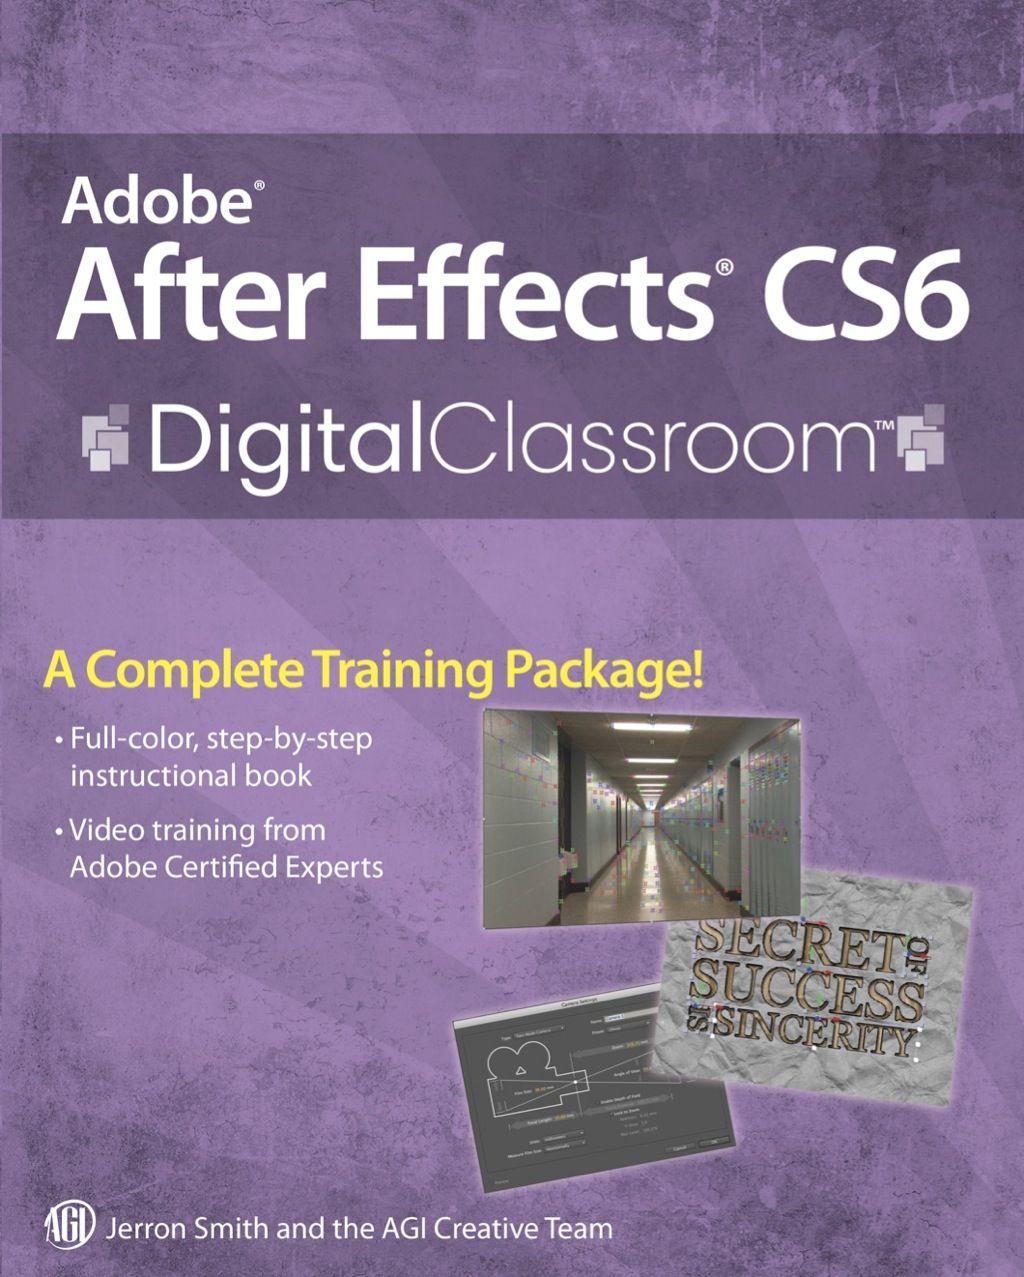 Adobe After Effects Cs6 Digital Classroom Ebook Adobe After